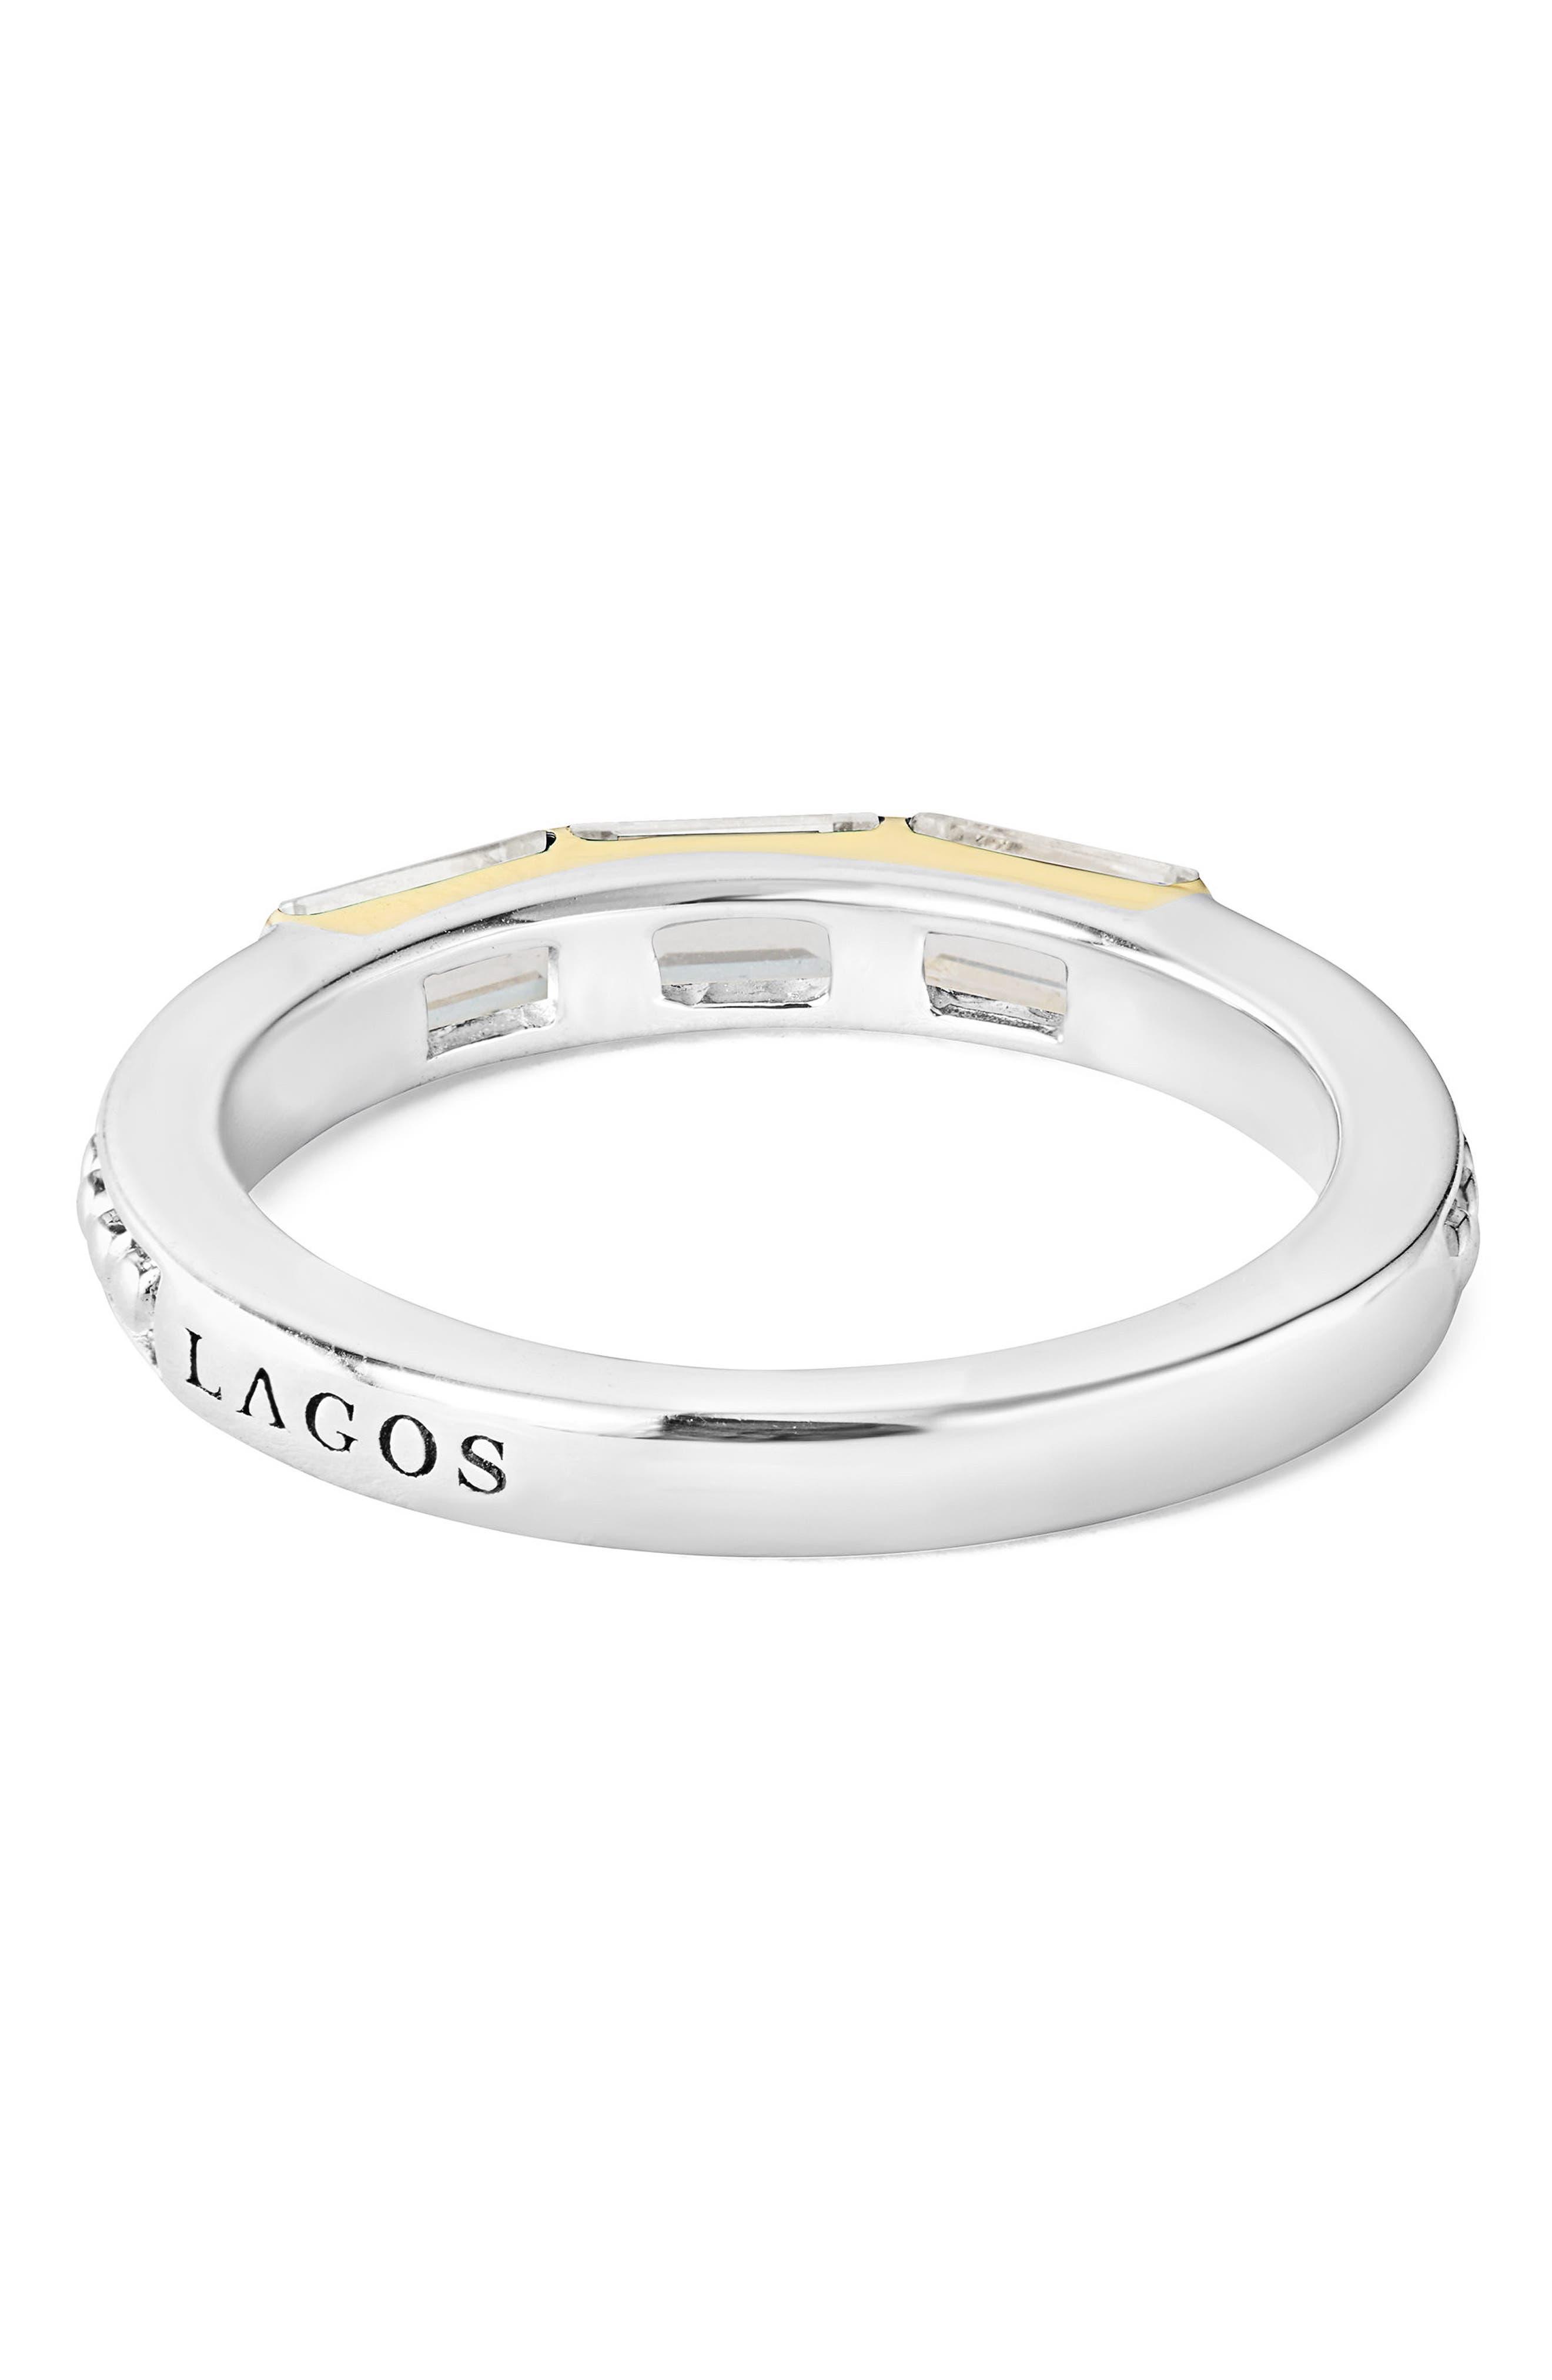 Gemstone Baguette Stackable Ring,                             Alternate thumbnail 3, color,                             SILVER/ 18K GOLD/ WHITE TOPAZ